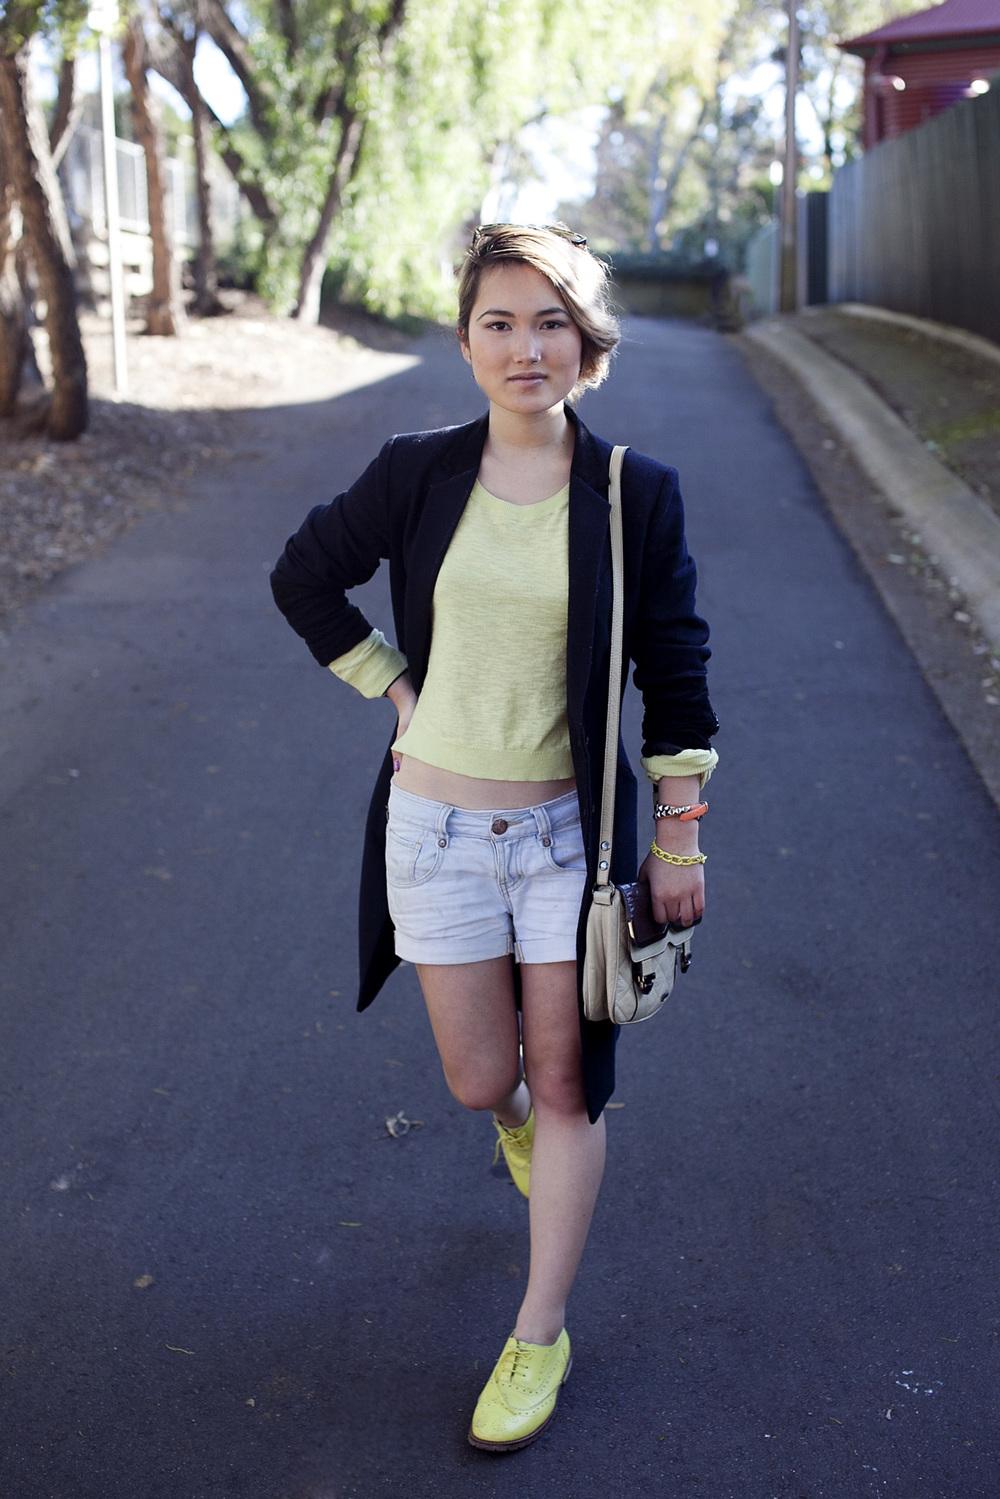 ASOS brogues | Sportsgirl jumper | Undercover byJun Takahashi for Uniqlo coat | Sass & Bide 'Bat for Boys' shorts